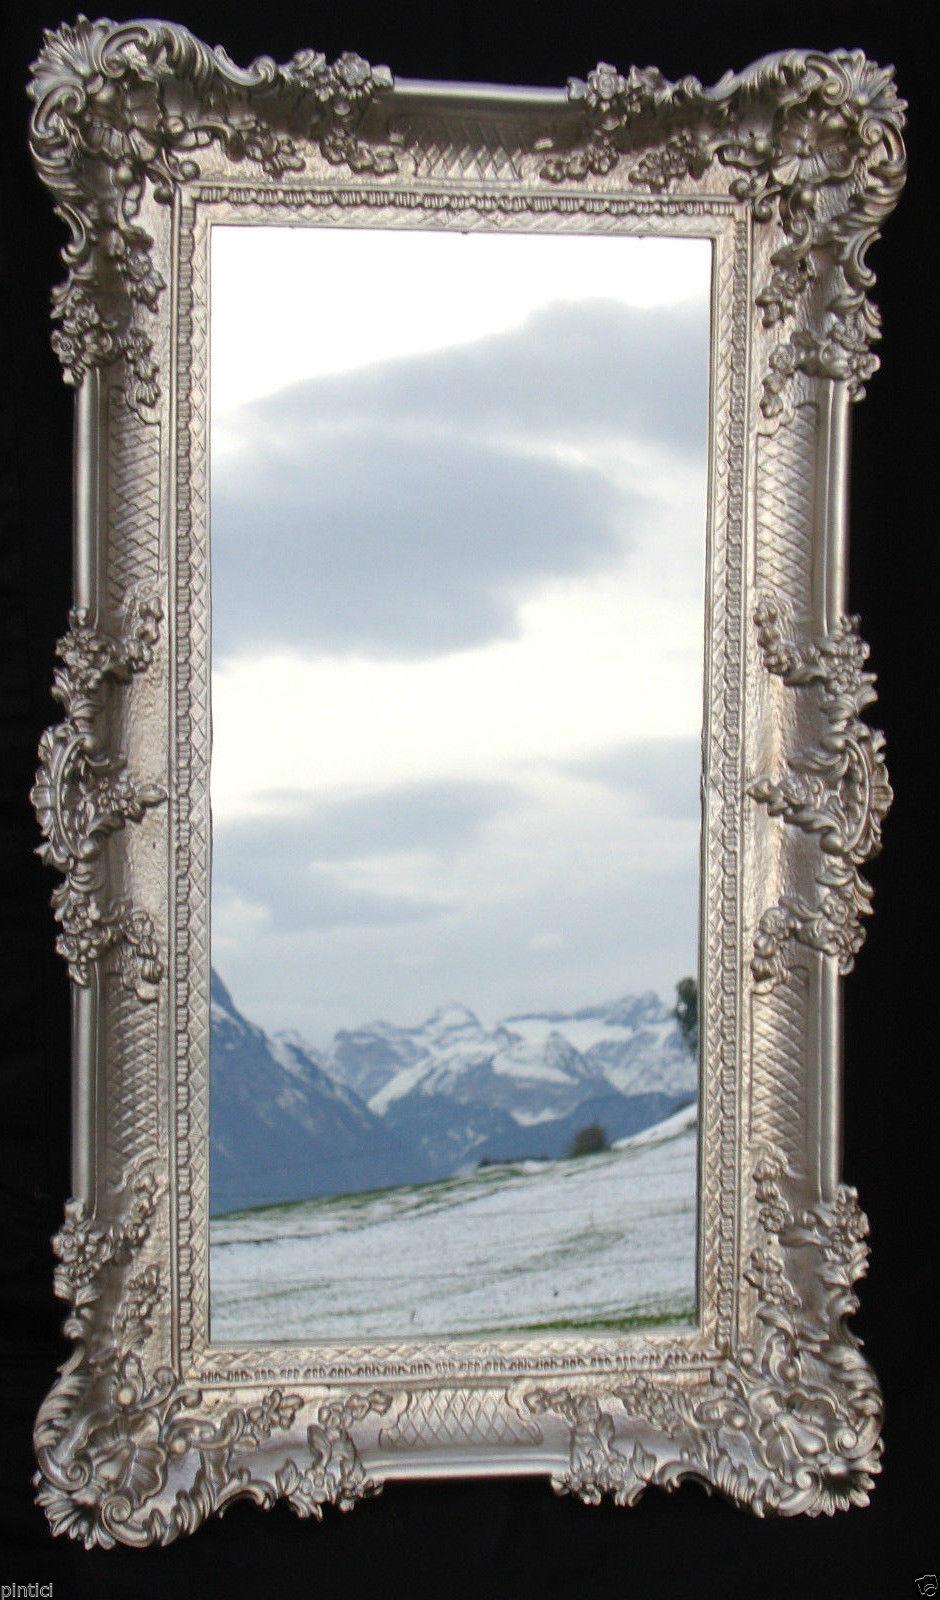 ... Wandspiegel Badspiegel Barock SILBERANTIK Spiegel Wand DEKO 97x57 Groß 2